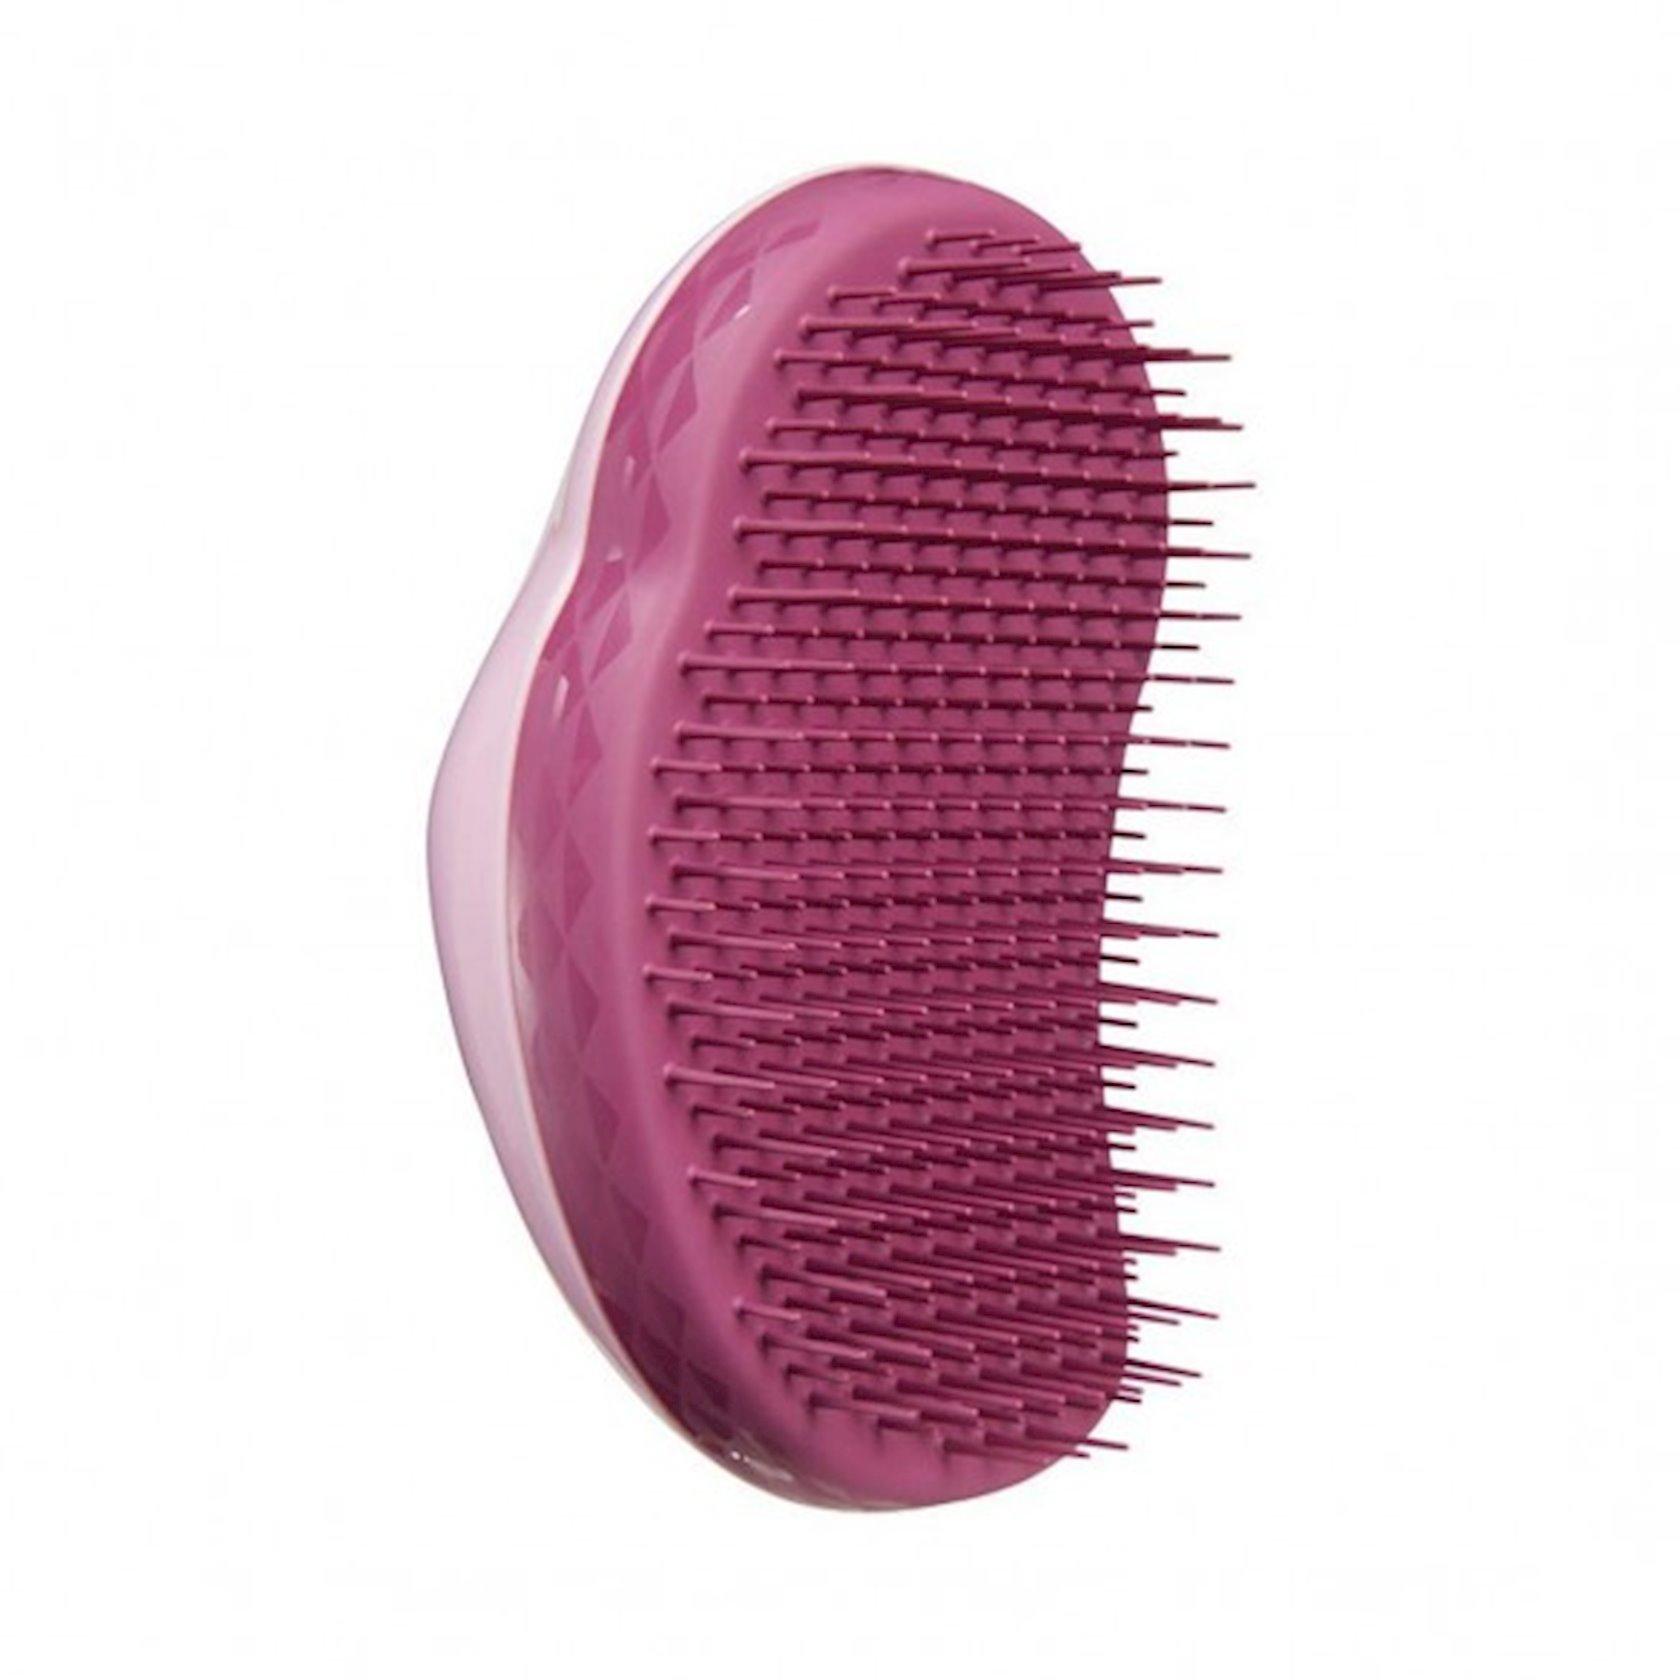 Saç fırçası Tangle Teezer The Original Pink Cupid Yığcam